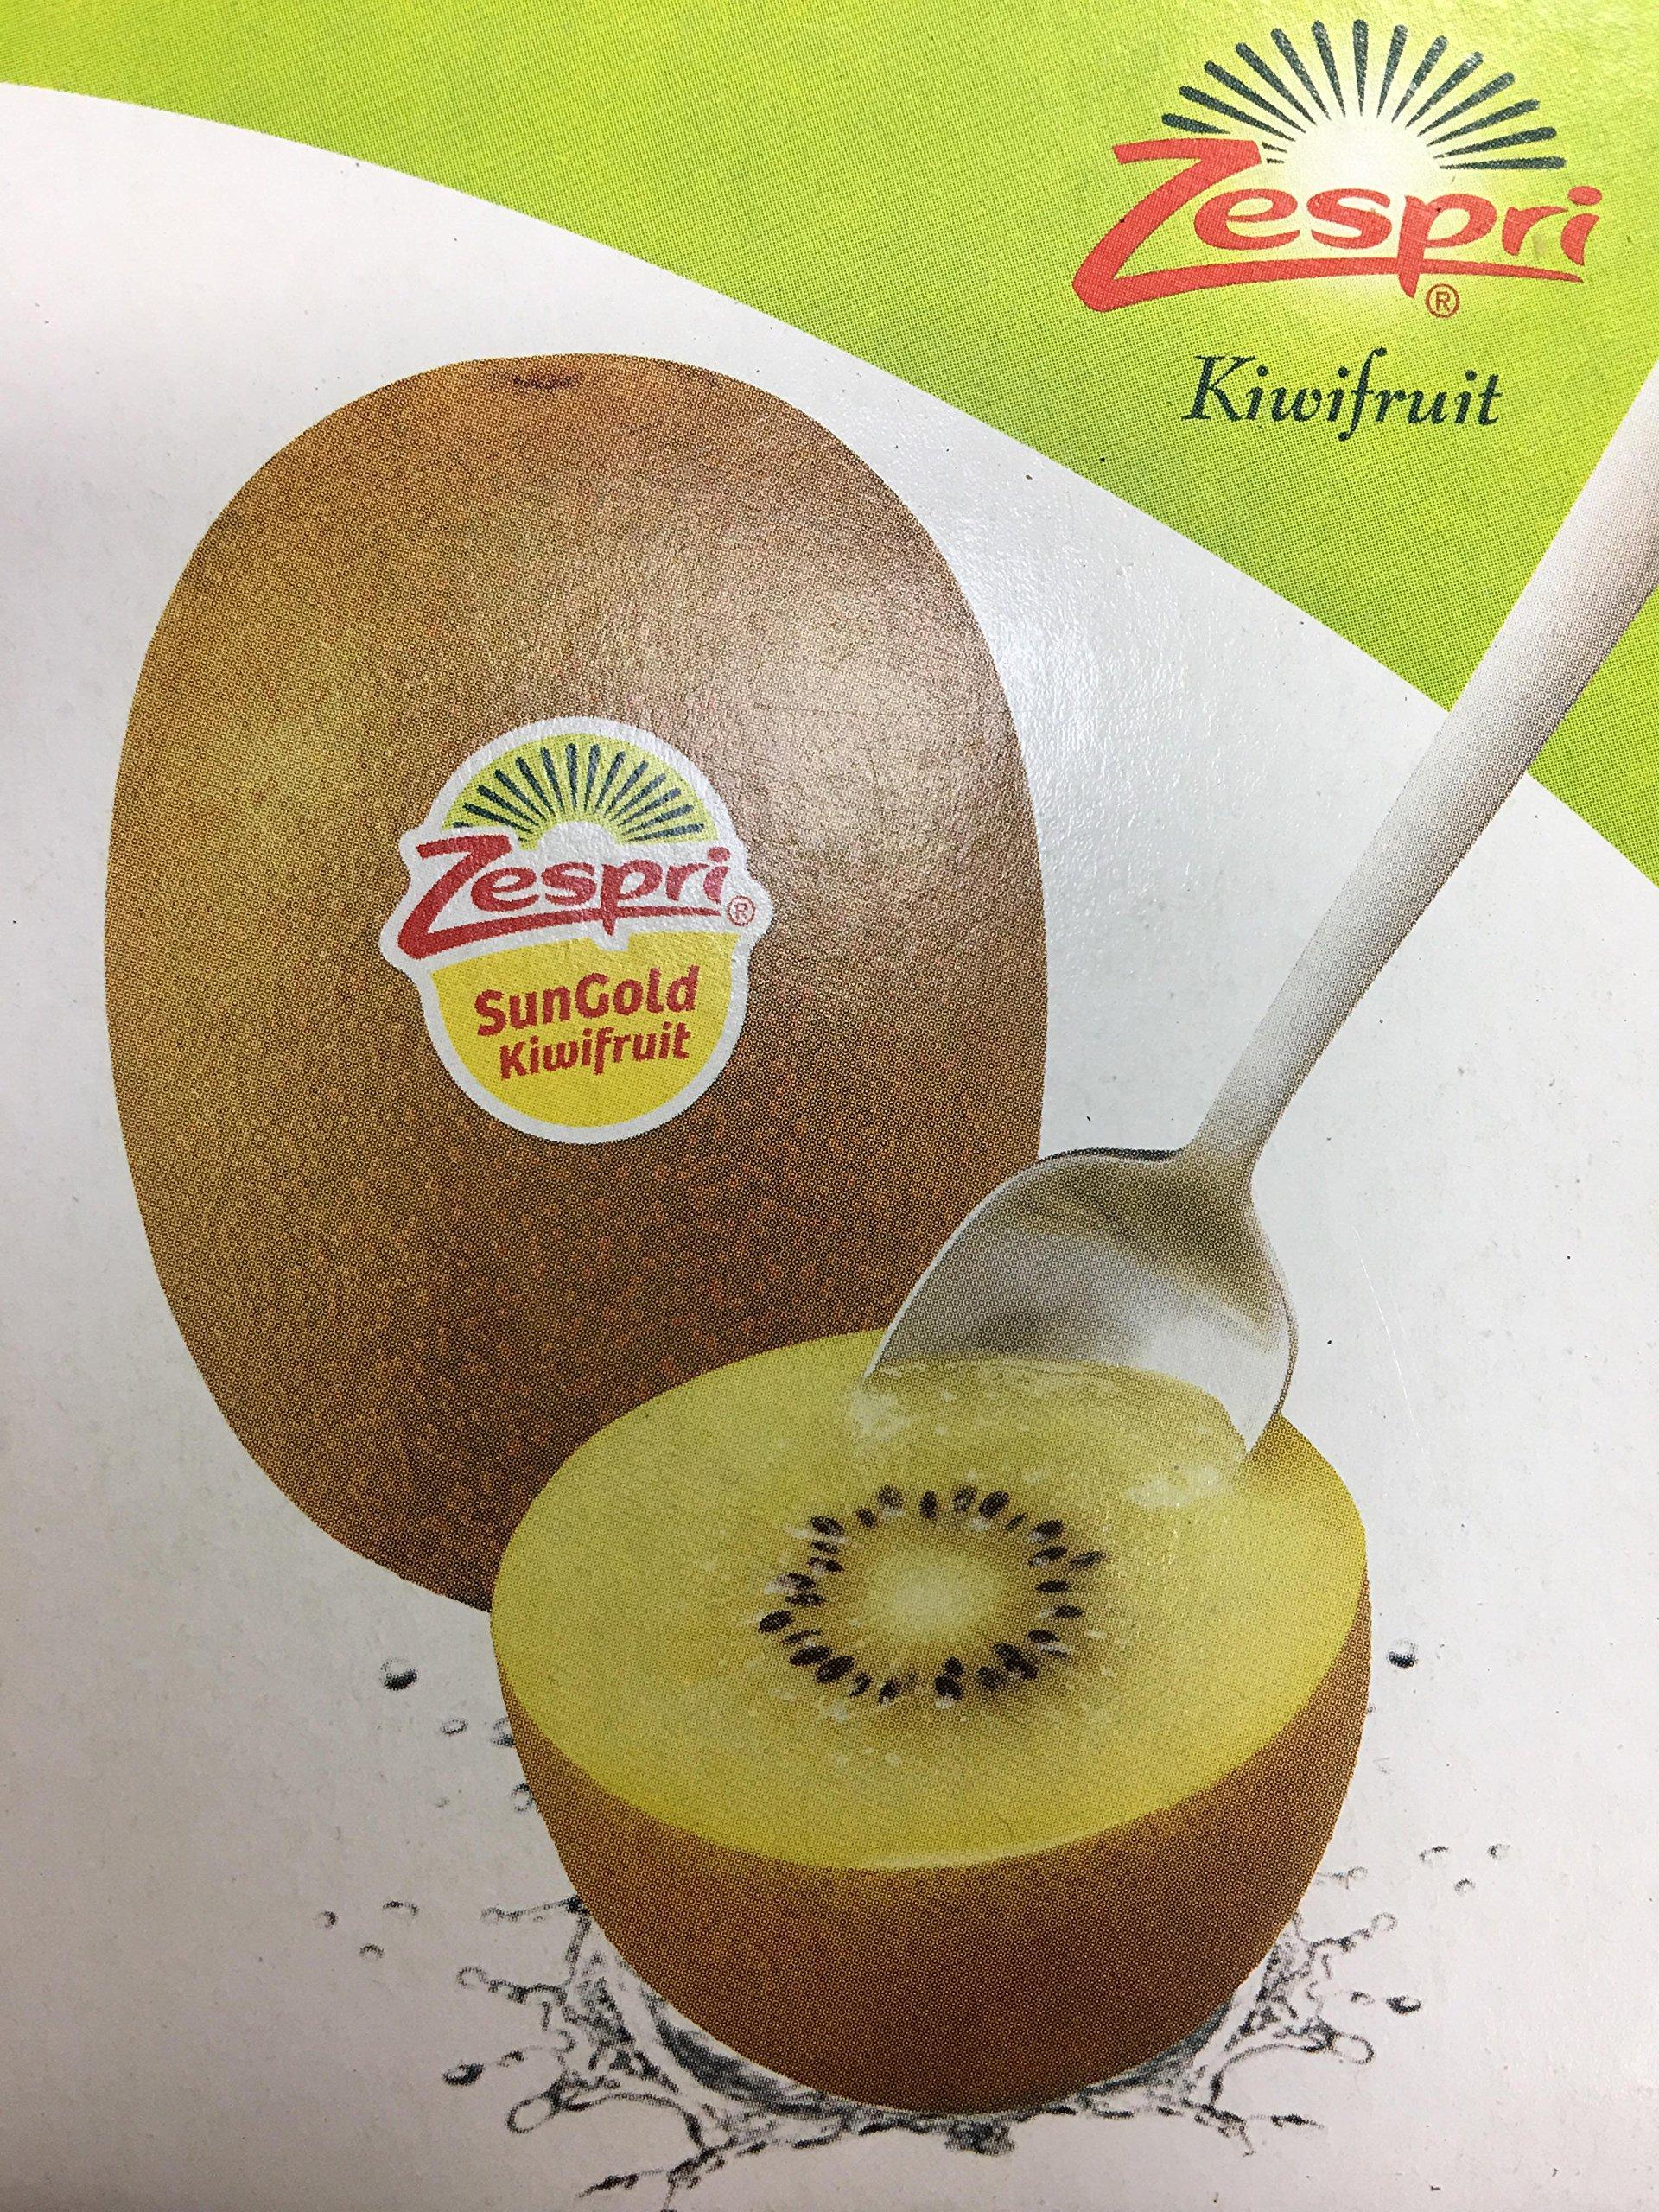 Sungold New Zealand Tropical Kiwi Fruit 4 lbs by Zespri (Image #1)